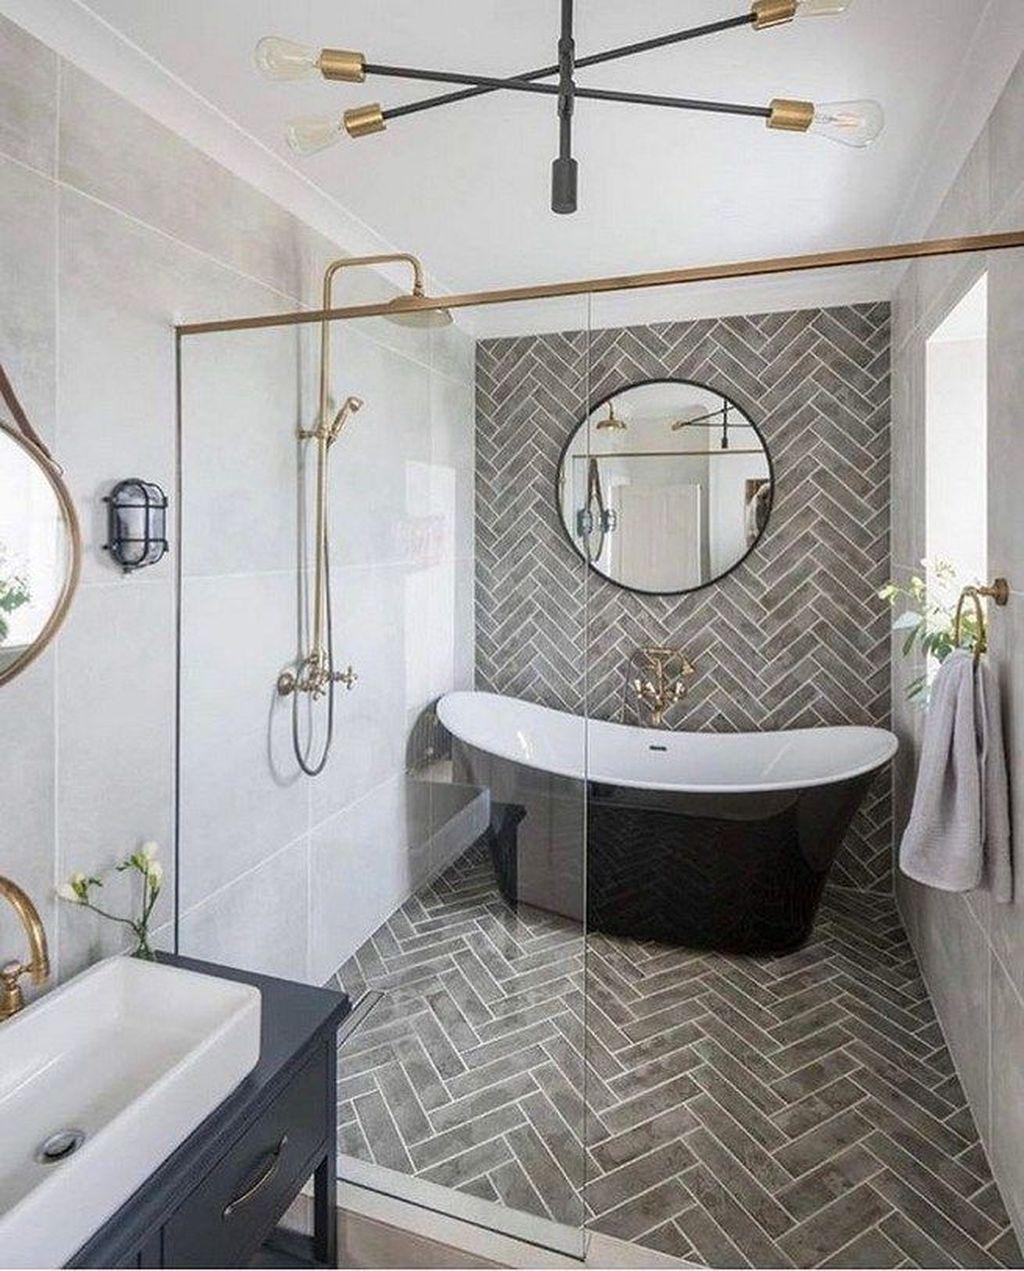 Unusual Bathroom Design Ideas You Need To Know 14